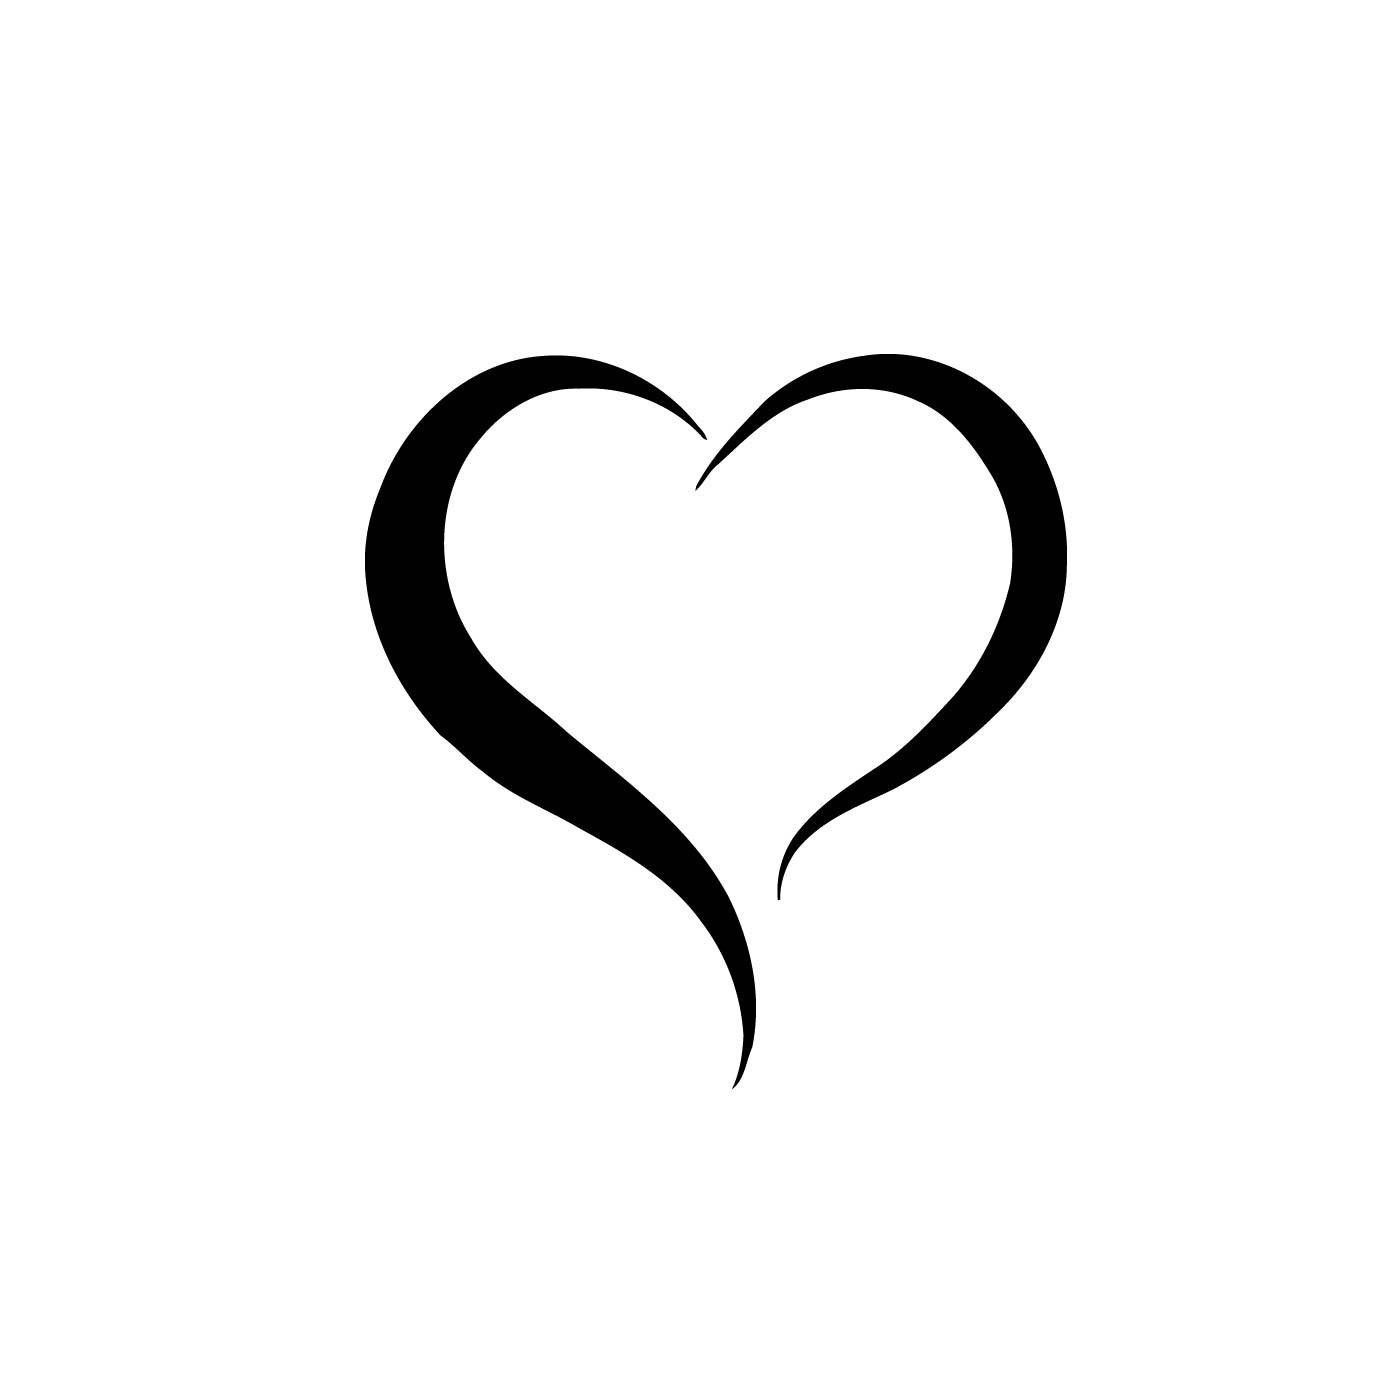 Two Lines Heart Vinyl Wall Art Black